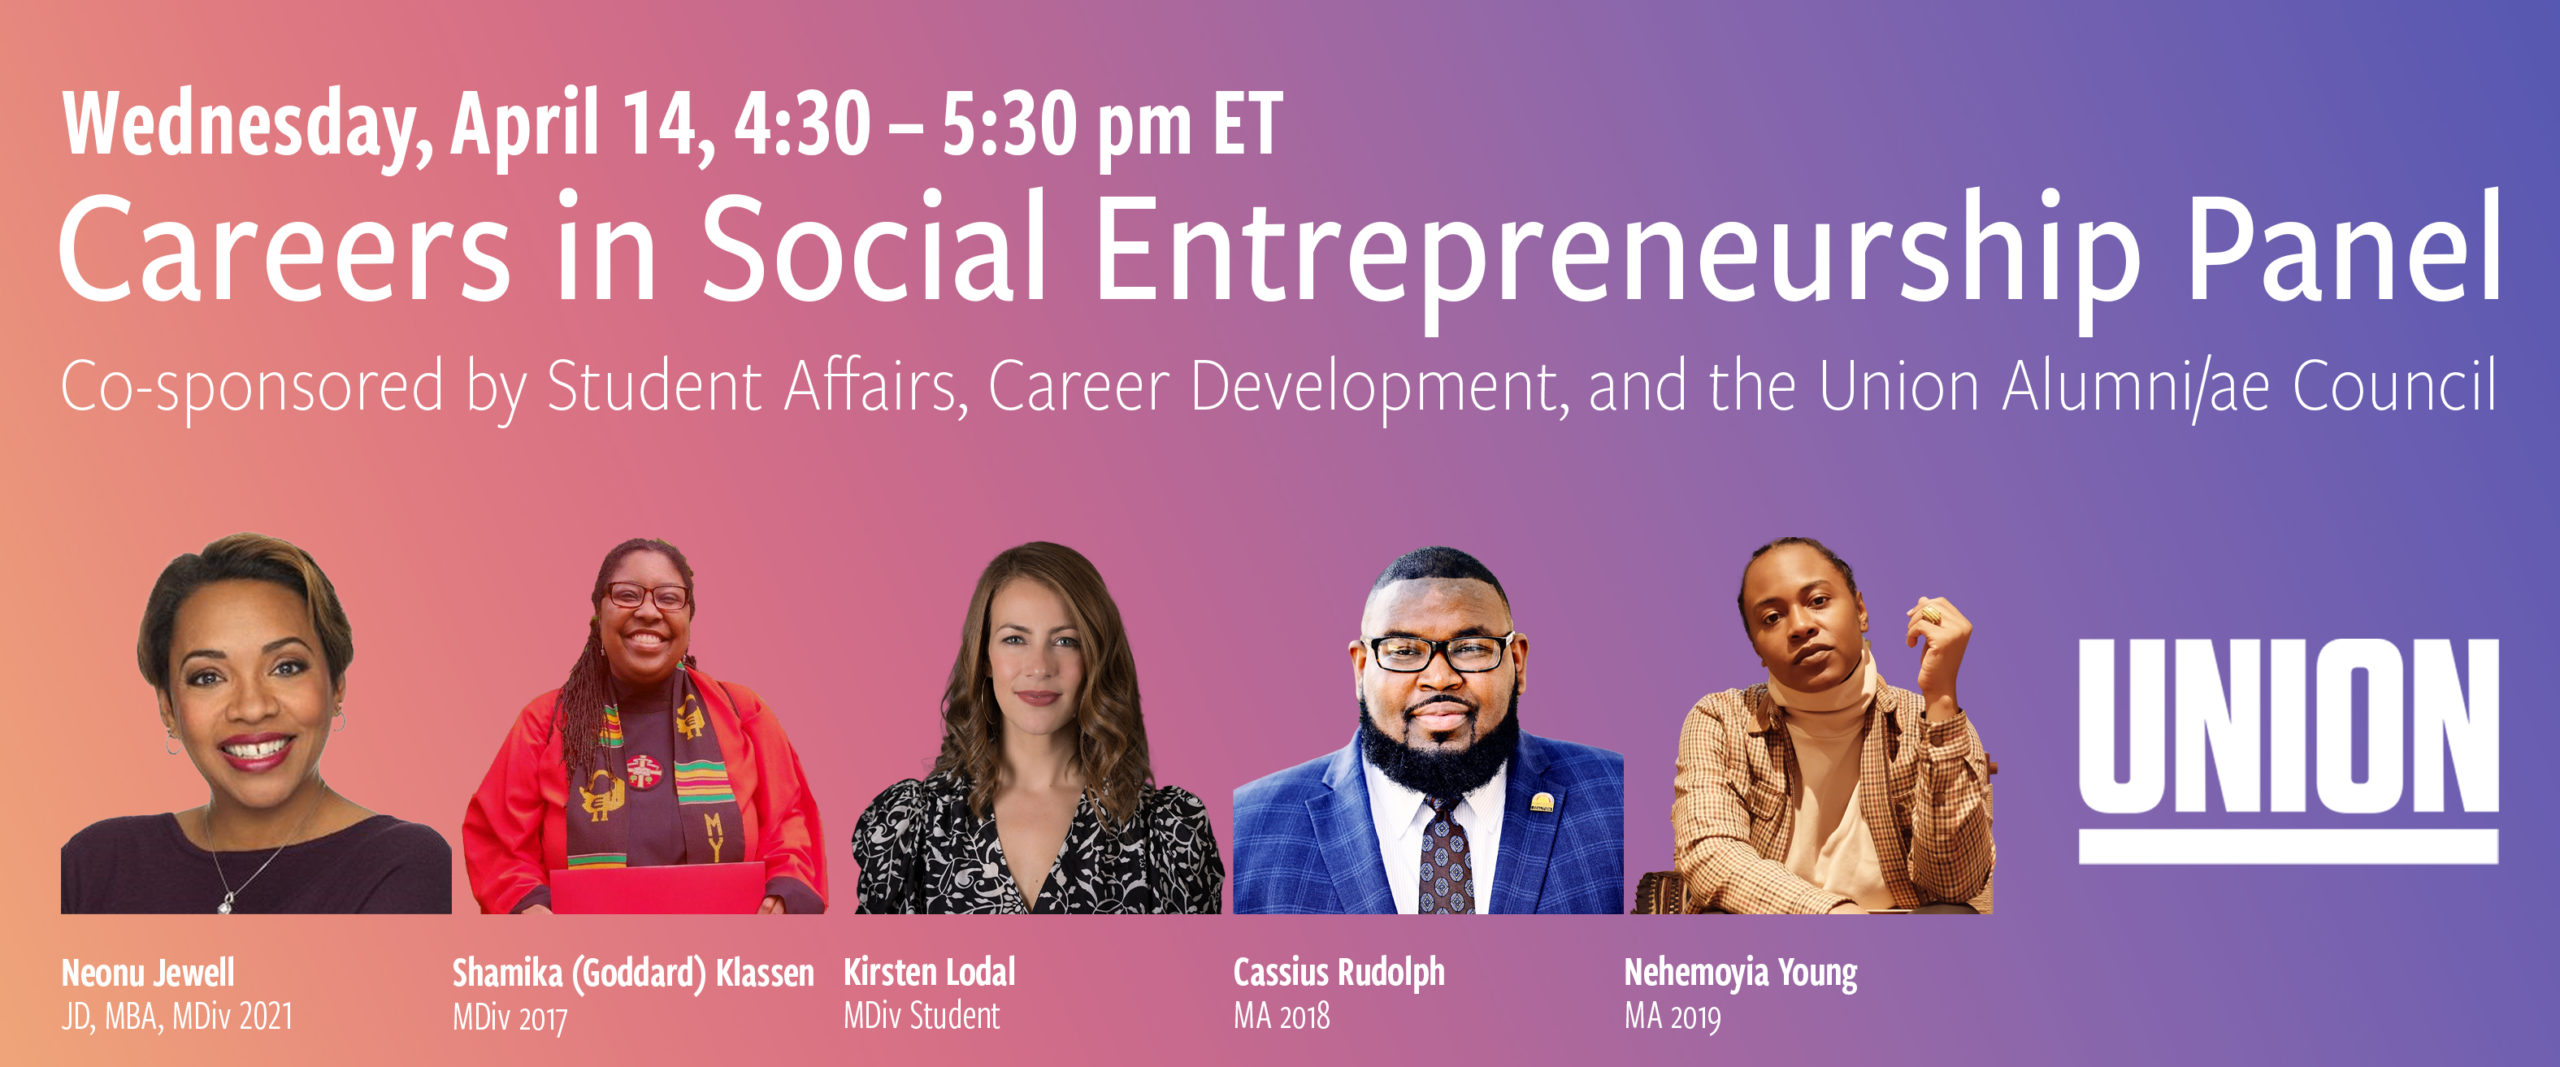 Careers in Social Entrepreneurship Panel Union Theological Seminary @ Zoom Webinar